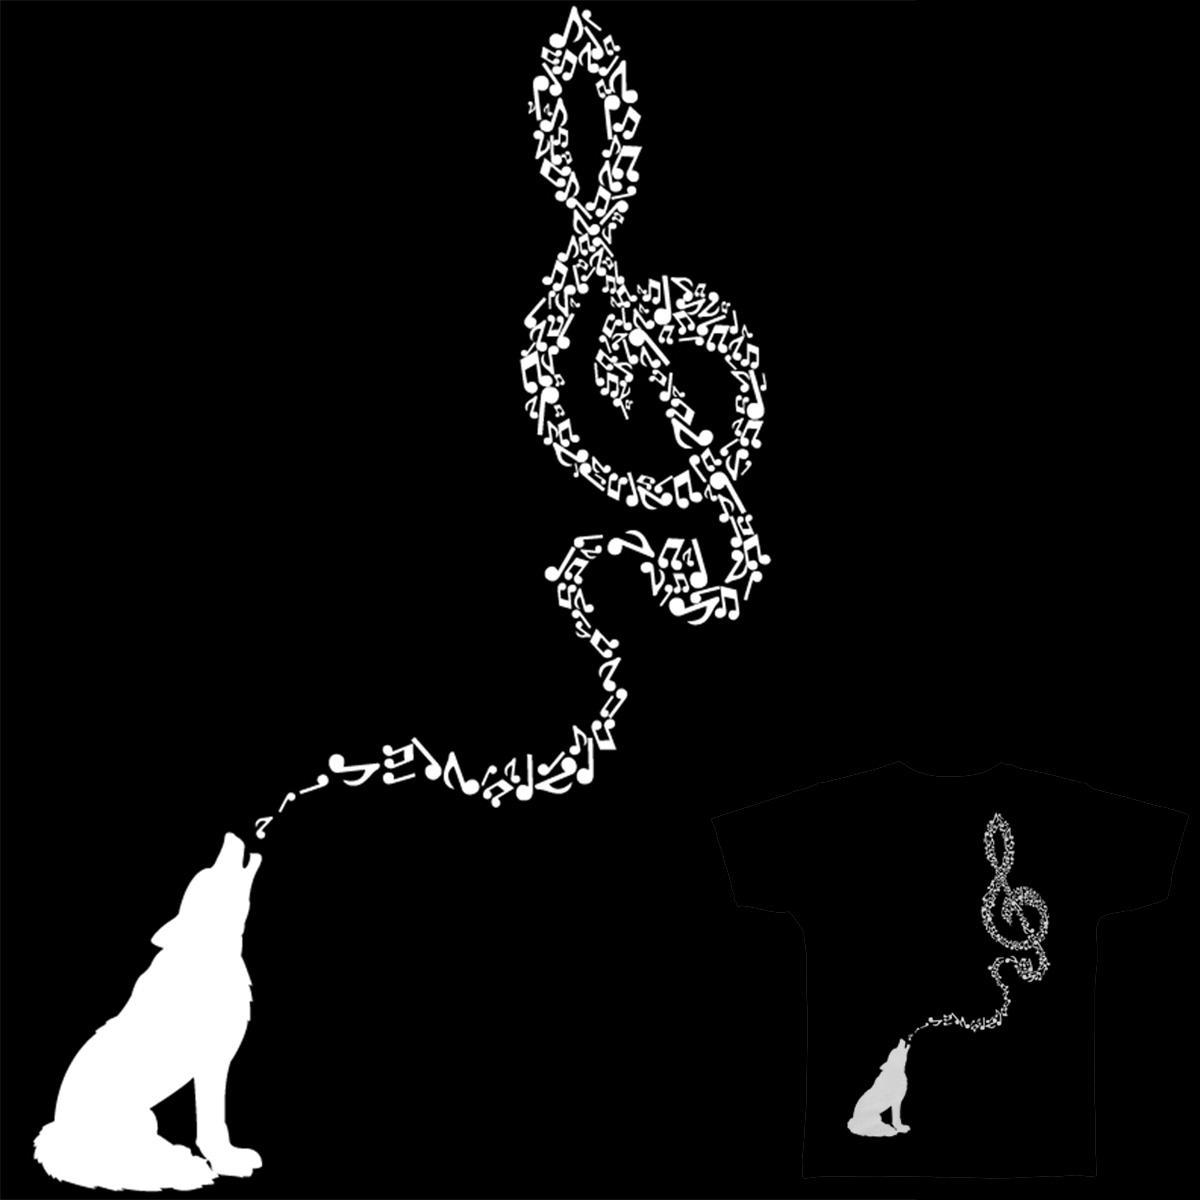 Midnight Symphony by RyanFoster on Threadless